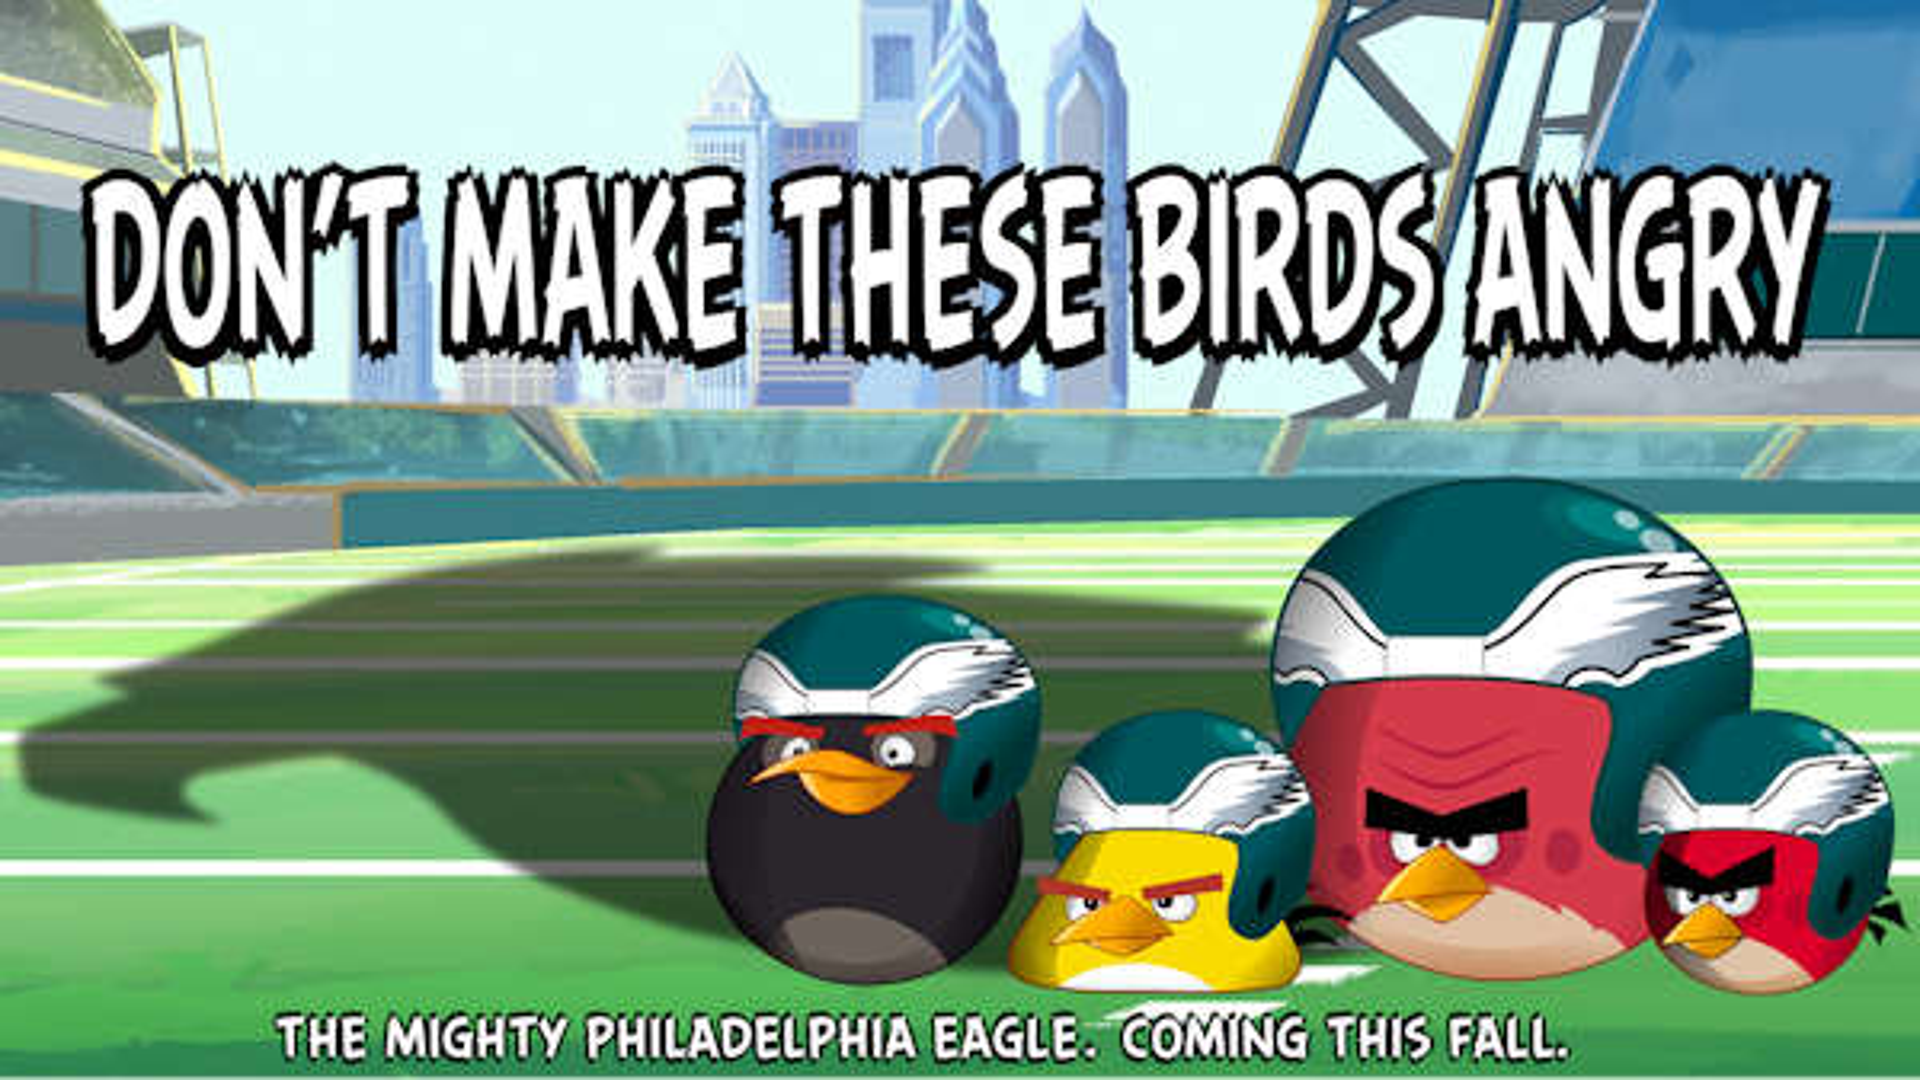 Plik:061312 ic phila eagles angry birds.jpg